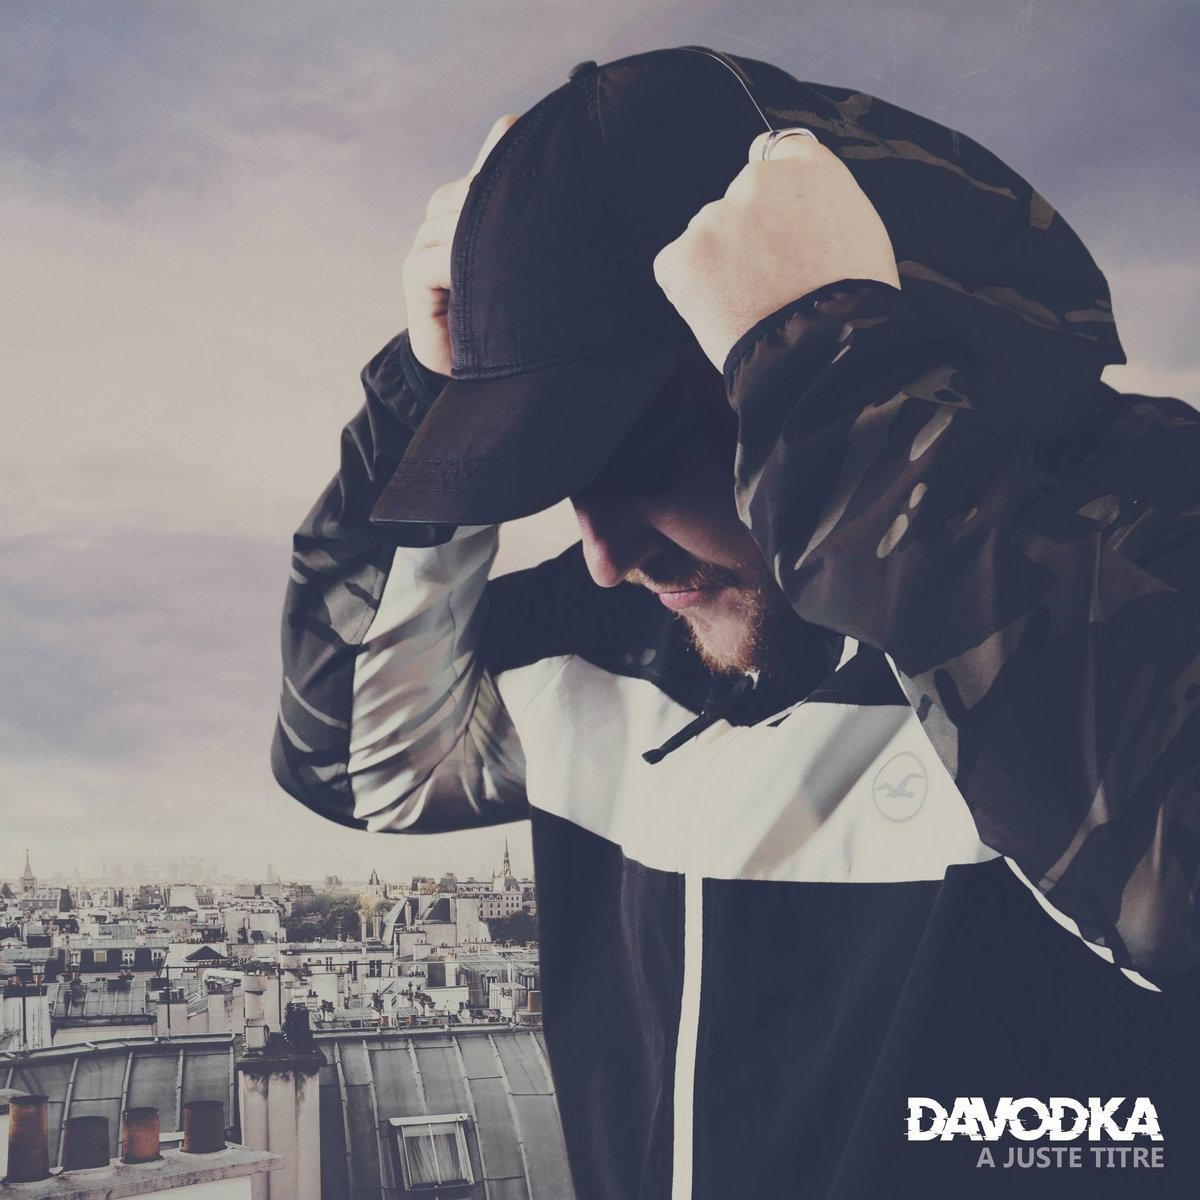 "Album Vinyle Davodka ""A juste titre"" de davodka sur Scredboutique.com"